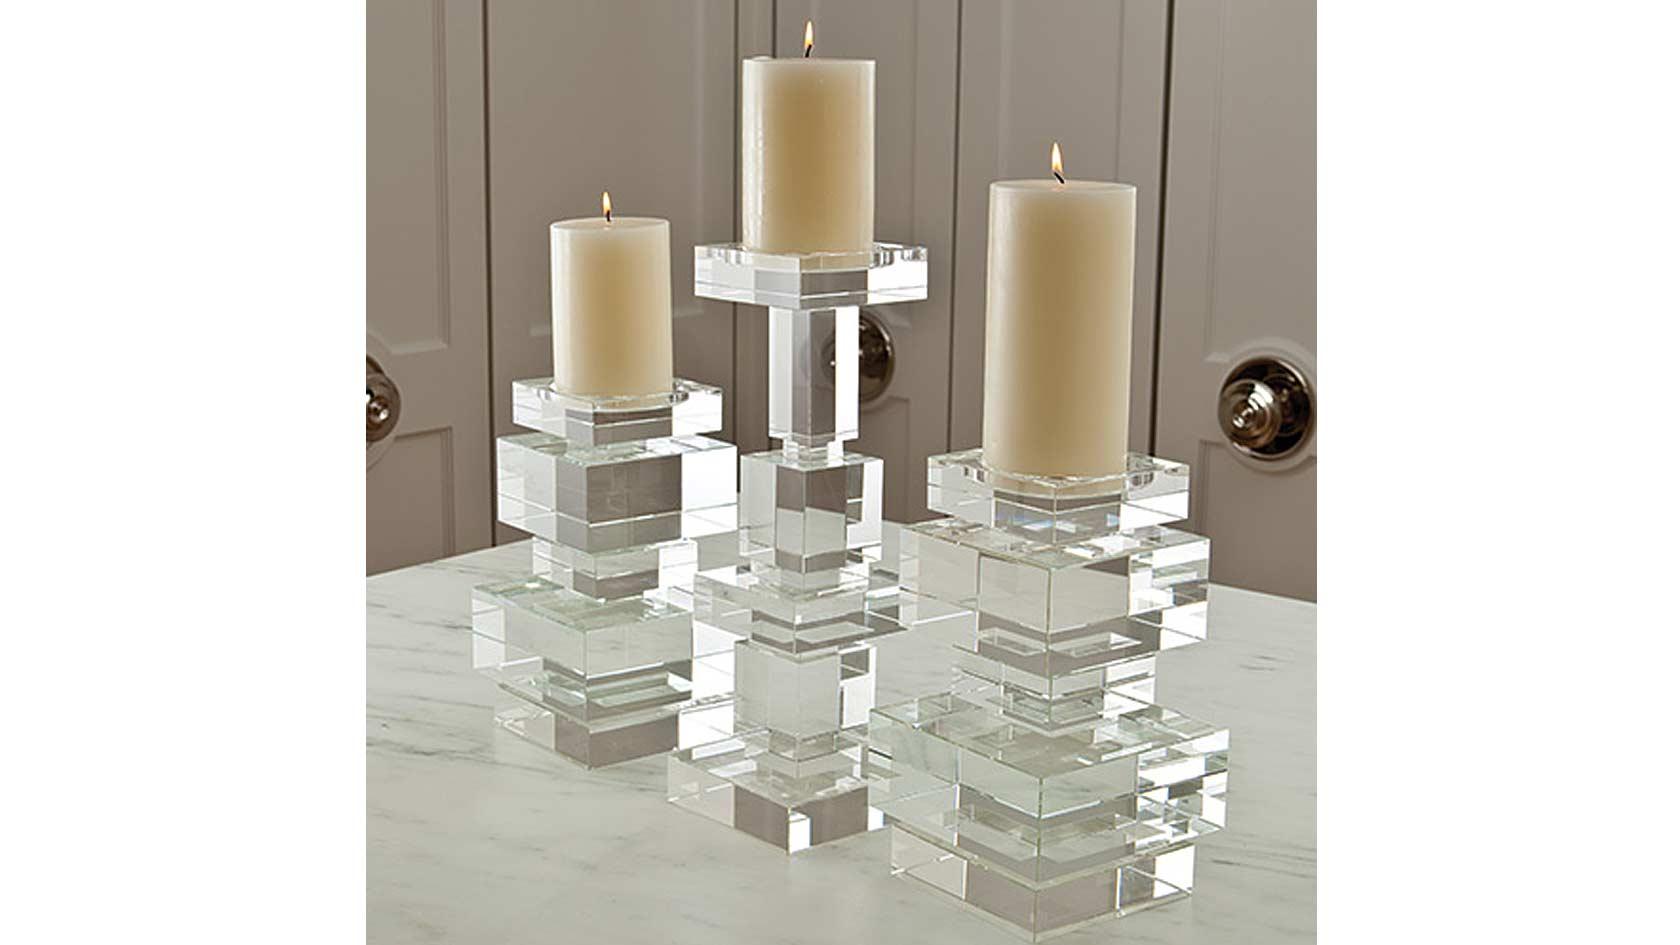 Marebrilliante Candle Holders